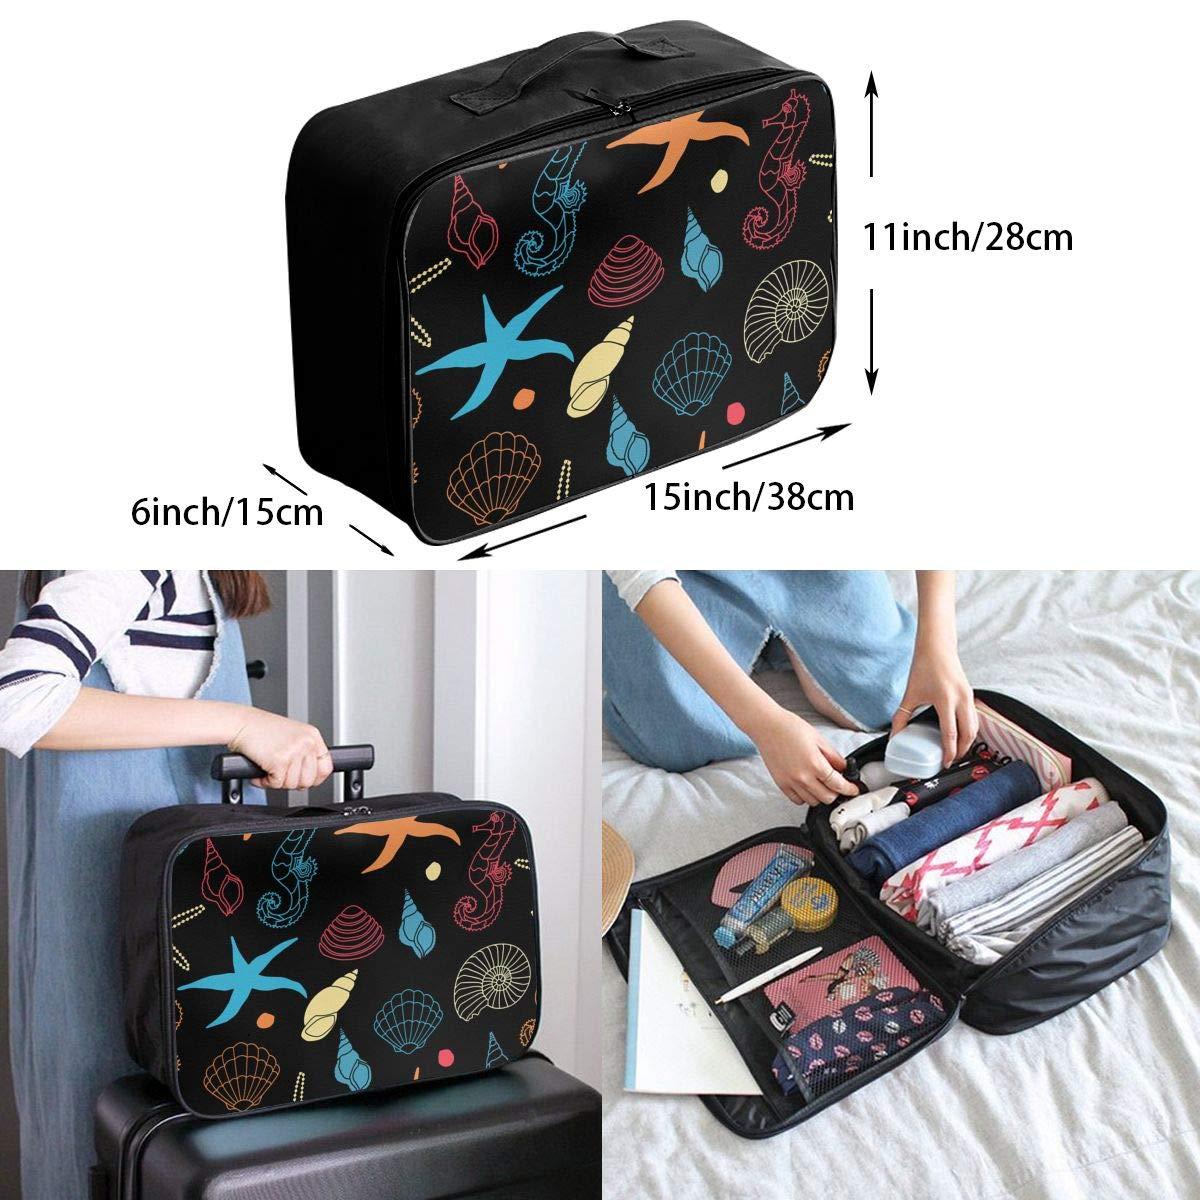 Travel Luggage Duffle Bag Lightweight Portable Handbag Seahorse Starfish Large Capacity Waterproof Foldable Storage Tote